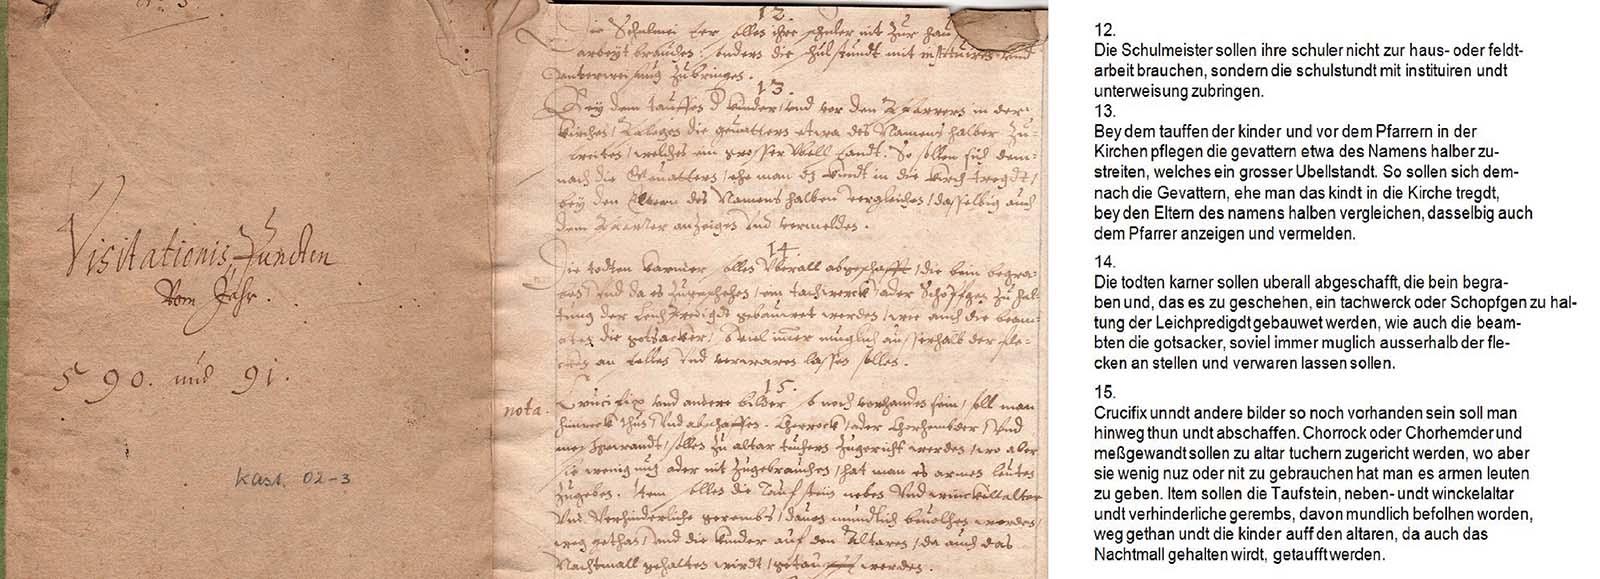 Visitationsprotokoll Kirchengemeinde Kastellaun 1590/91